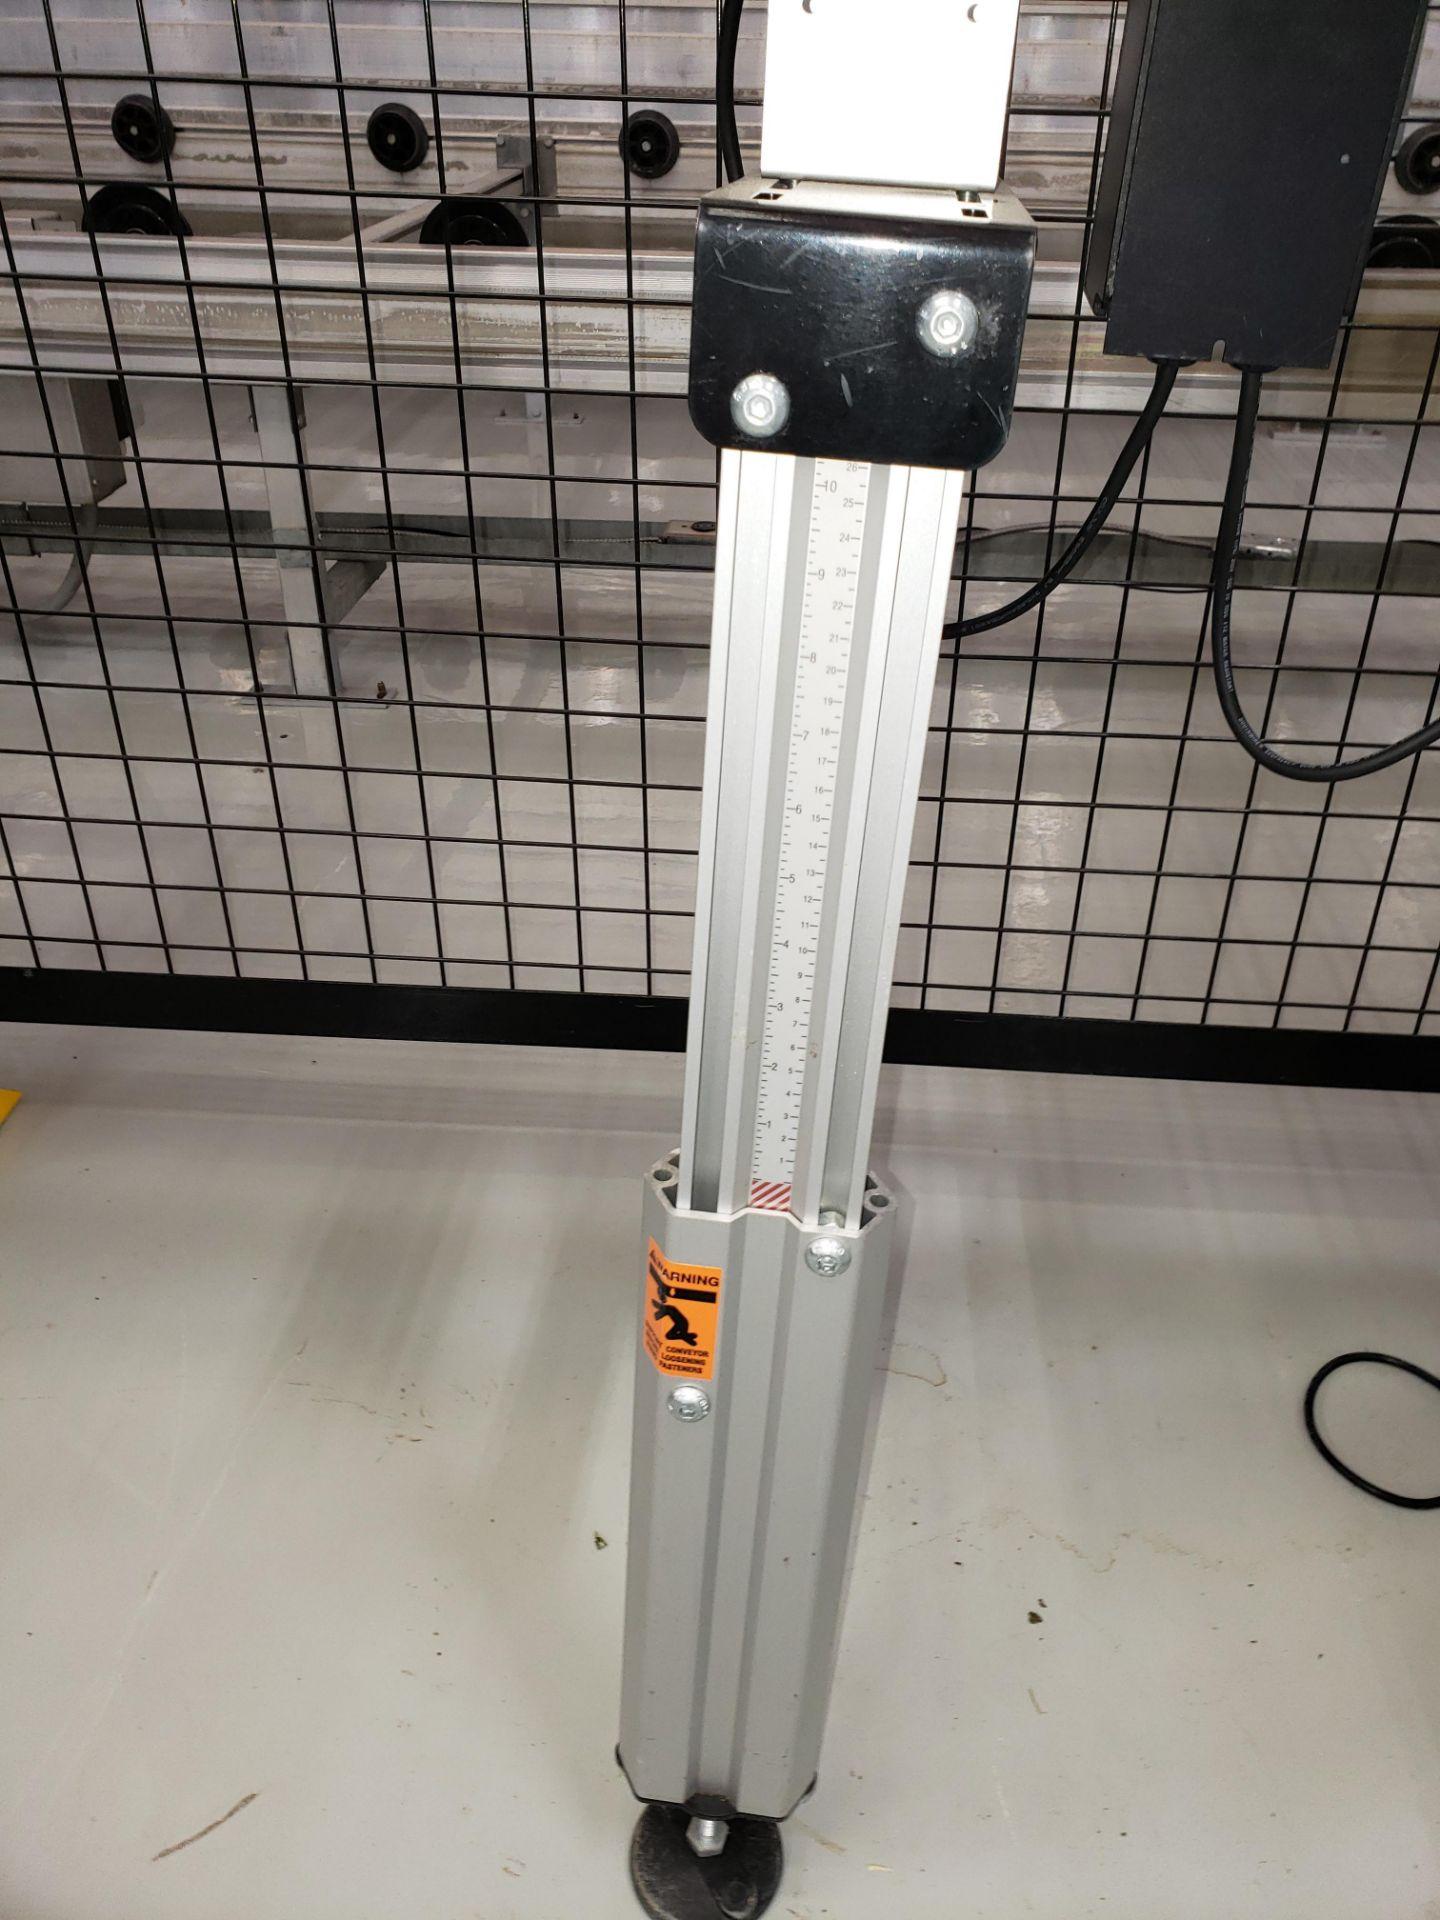 Kierton Twister Input Conveyor 5.5' - Image 4 of 9